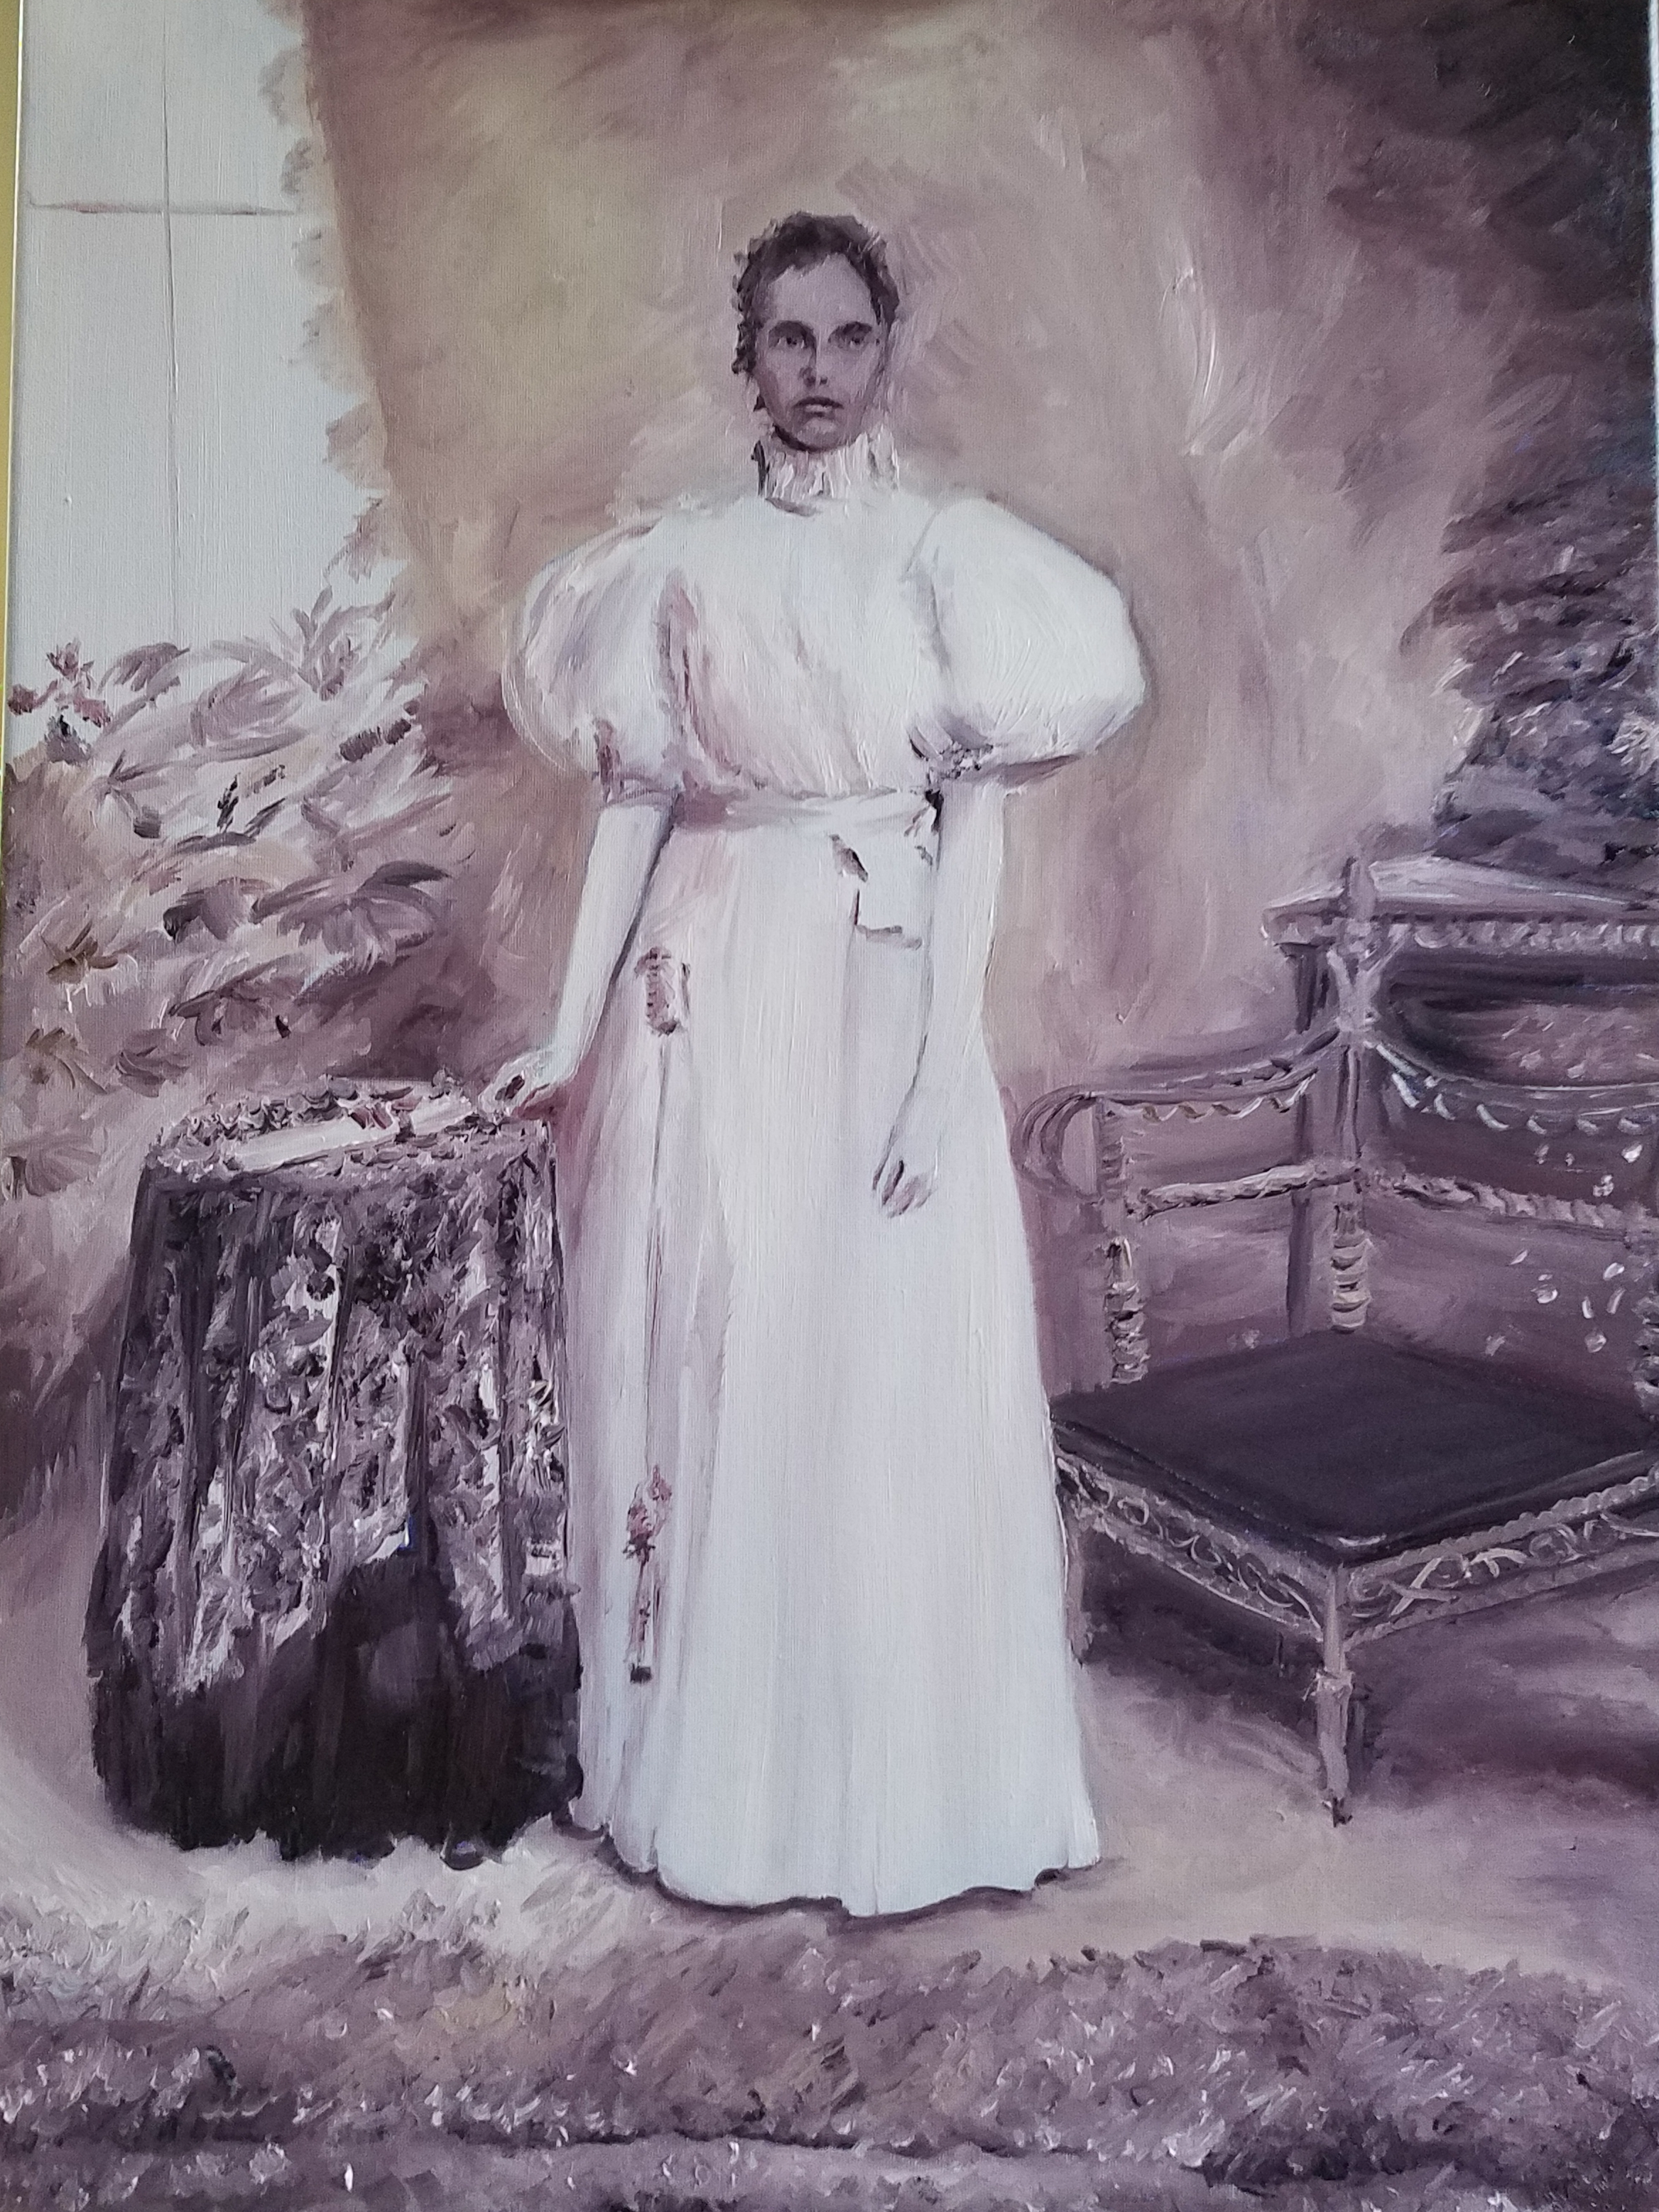 Victorian Grandmother; oil on linen; 2018